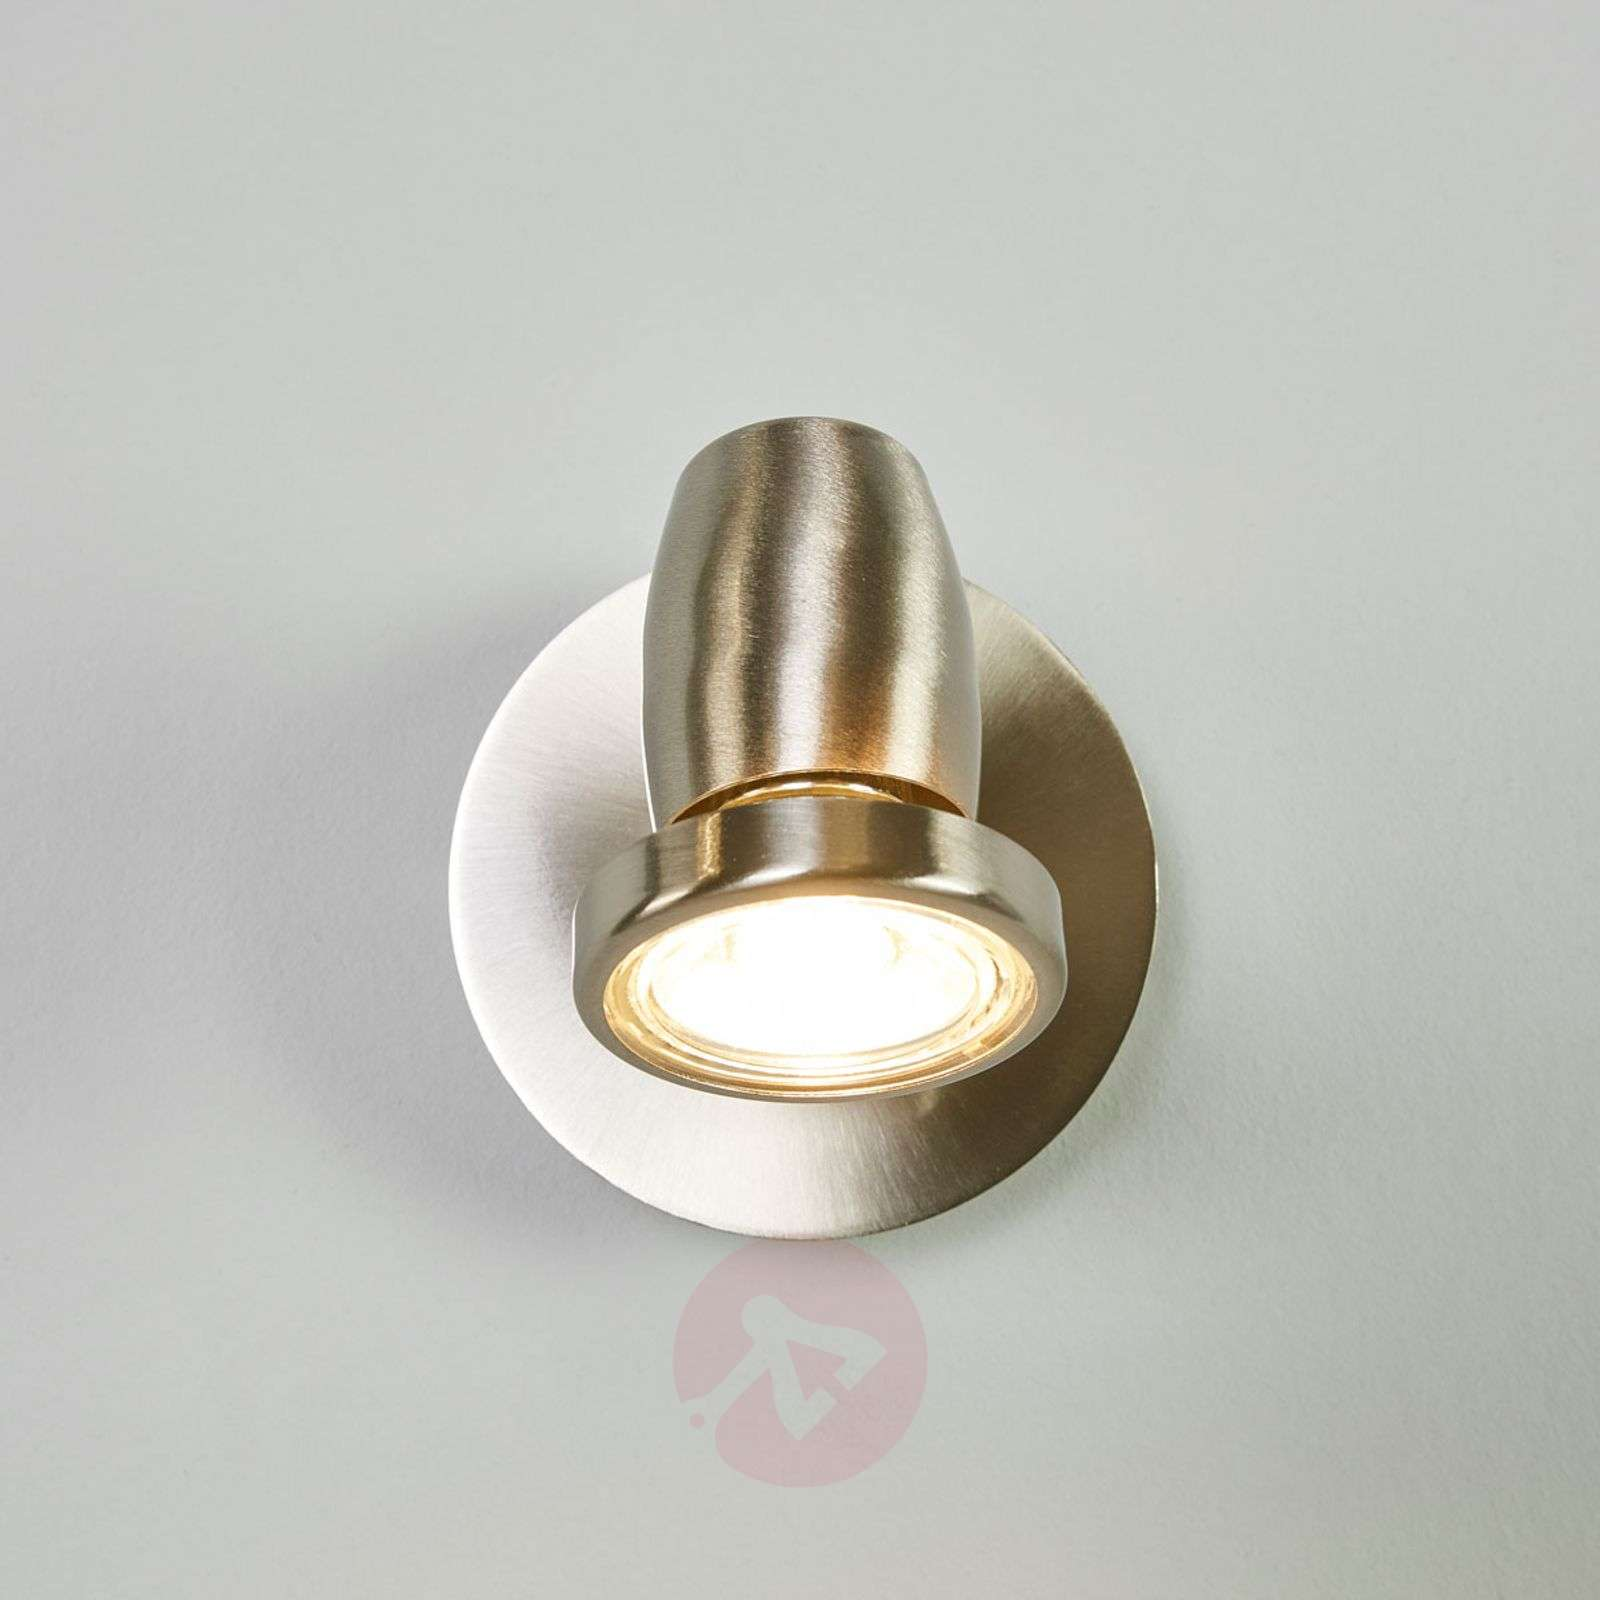 Nickel-plated LED wall spotlight Celestine-9954017-02